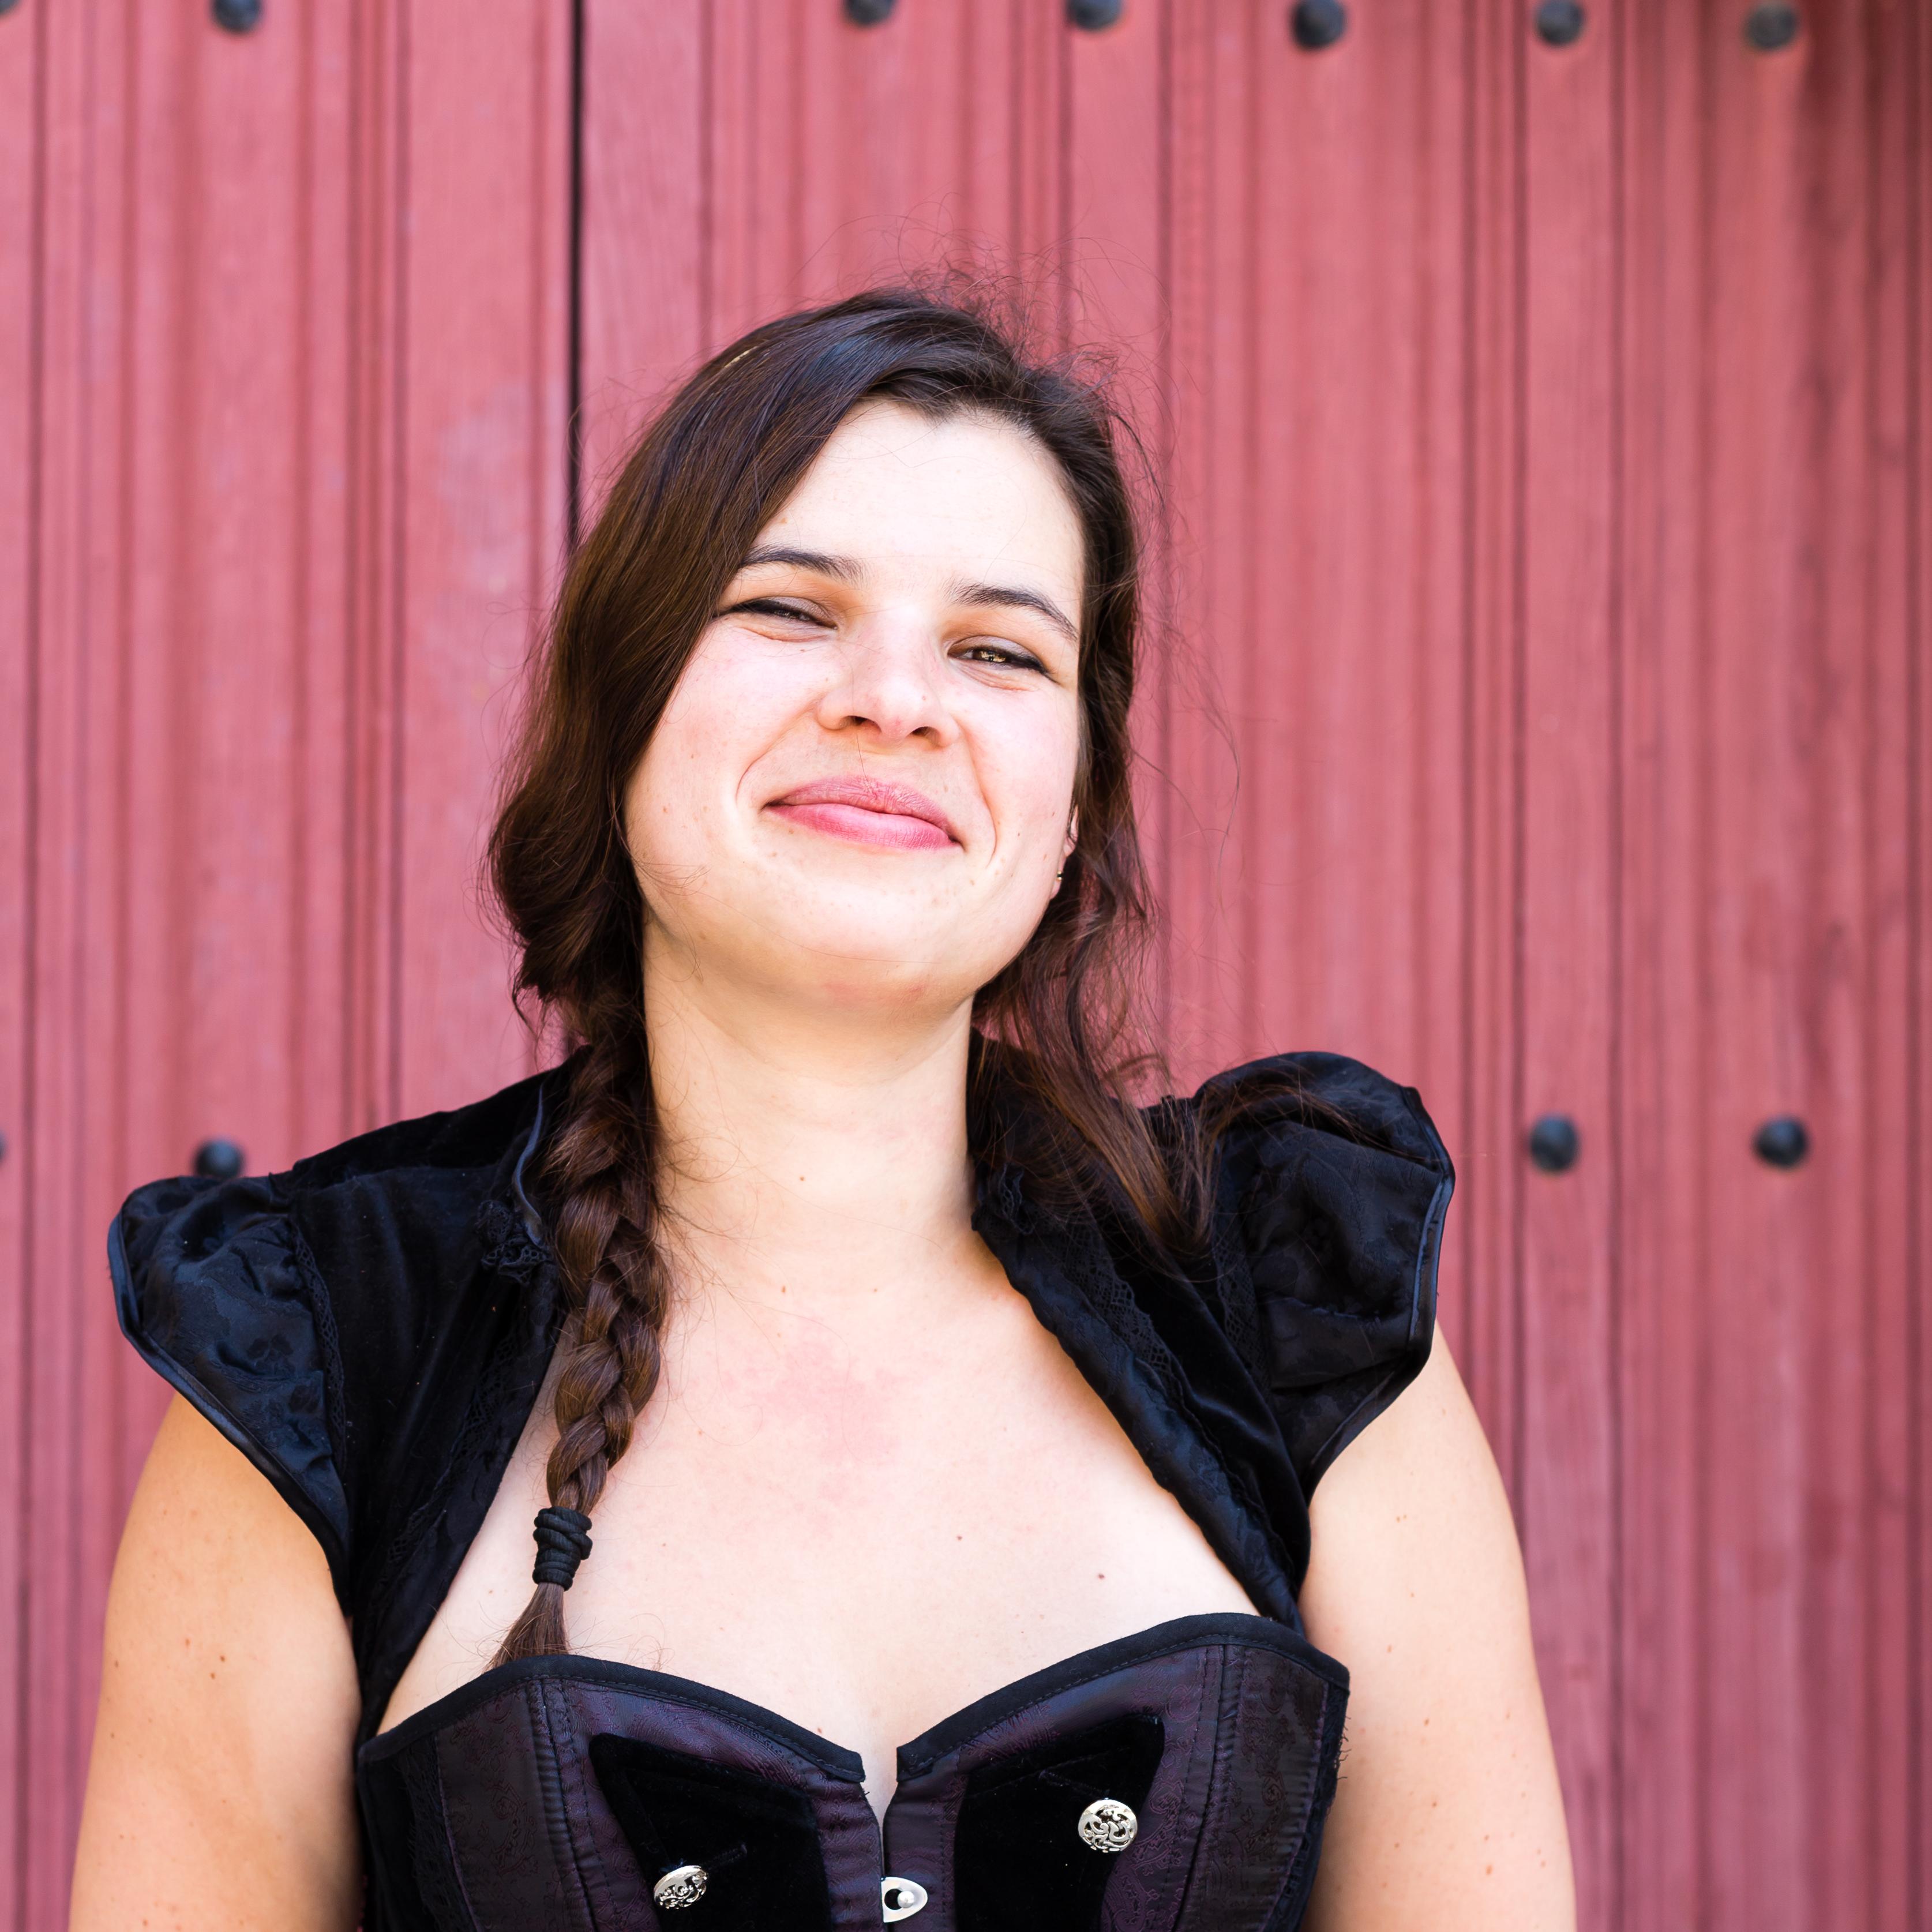 Rencontre fille bulgare - Premire phrase pour site de rencontre